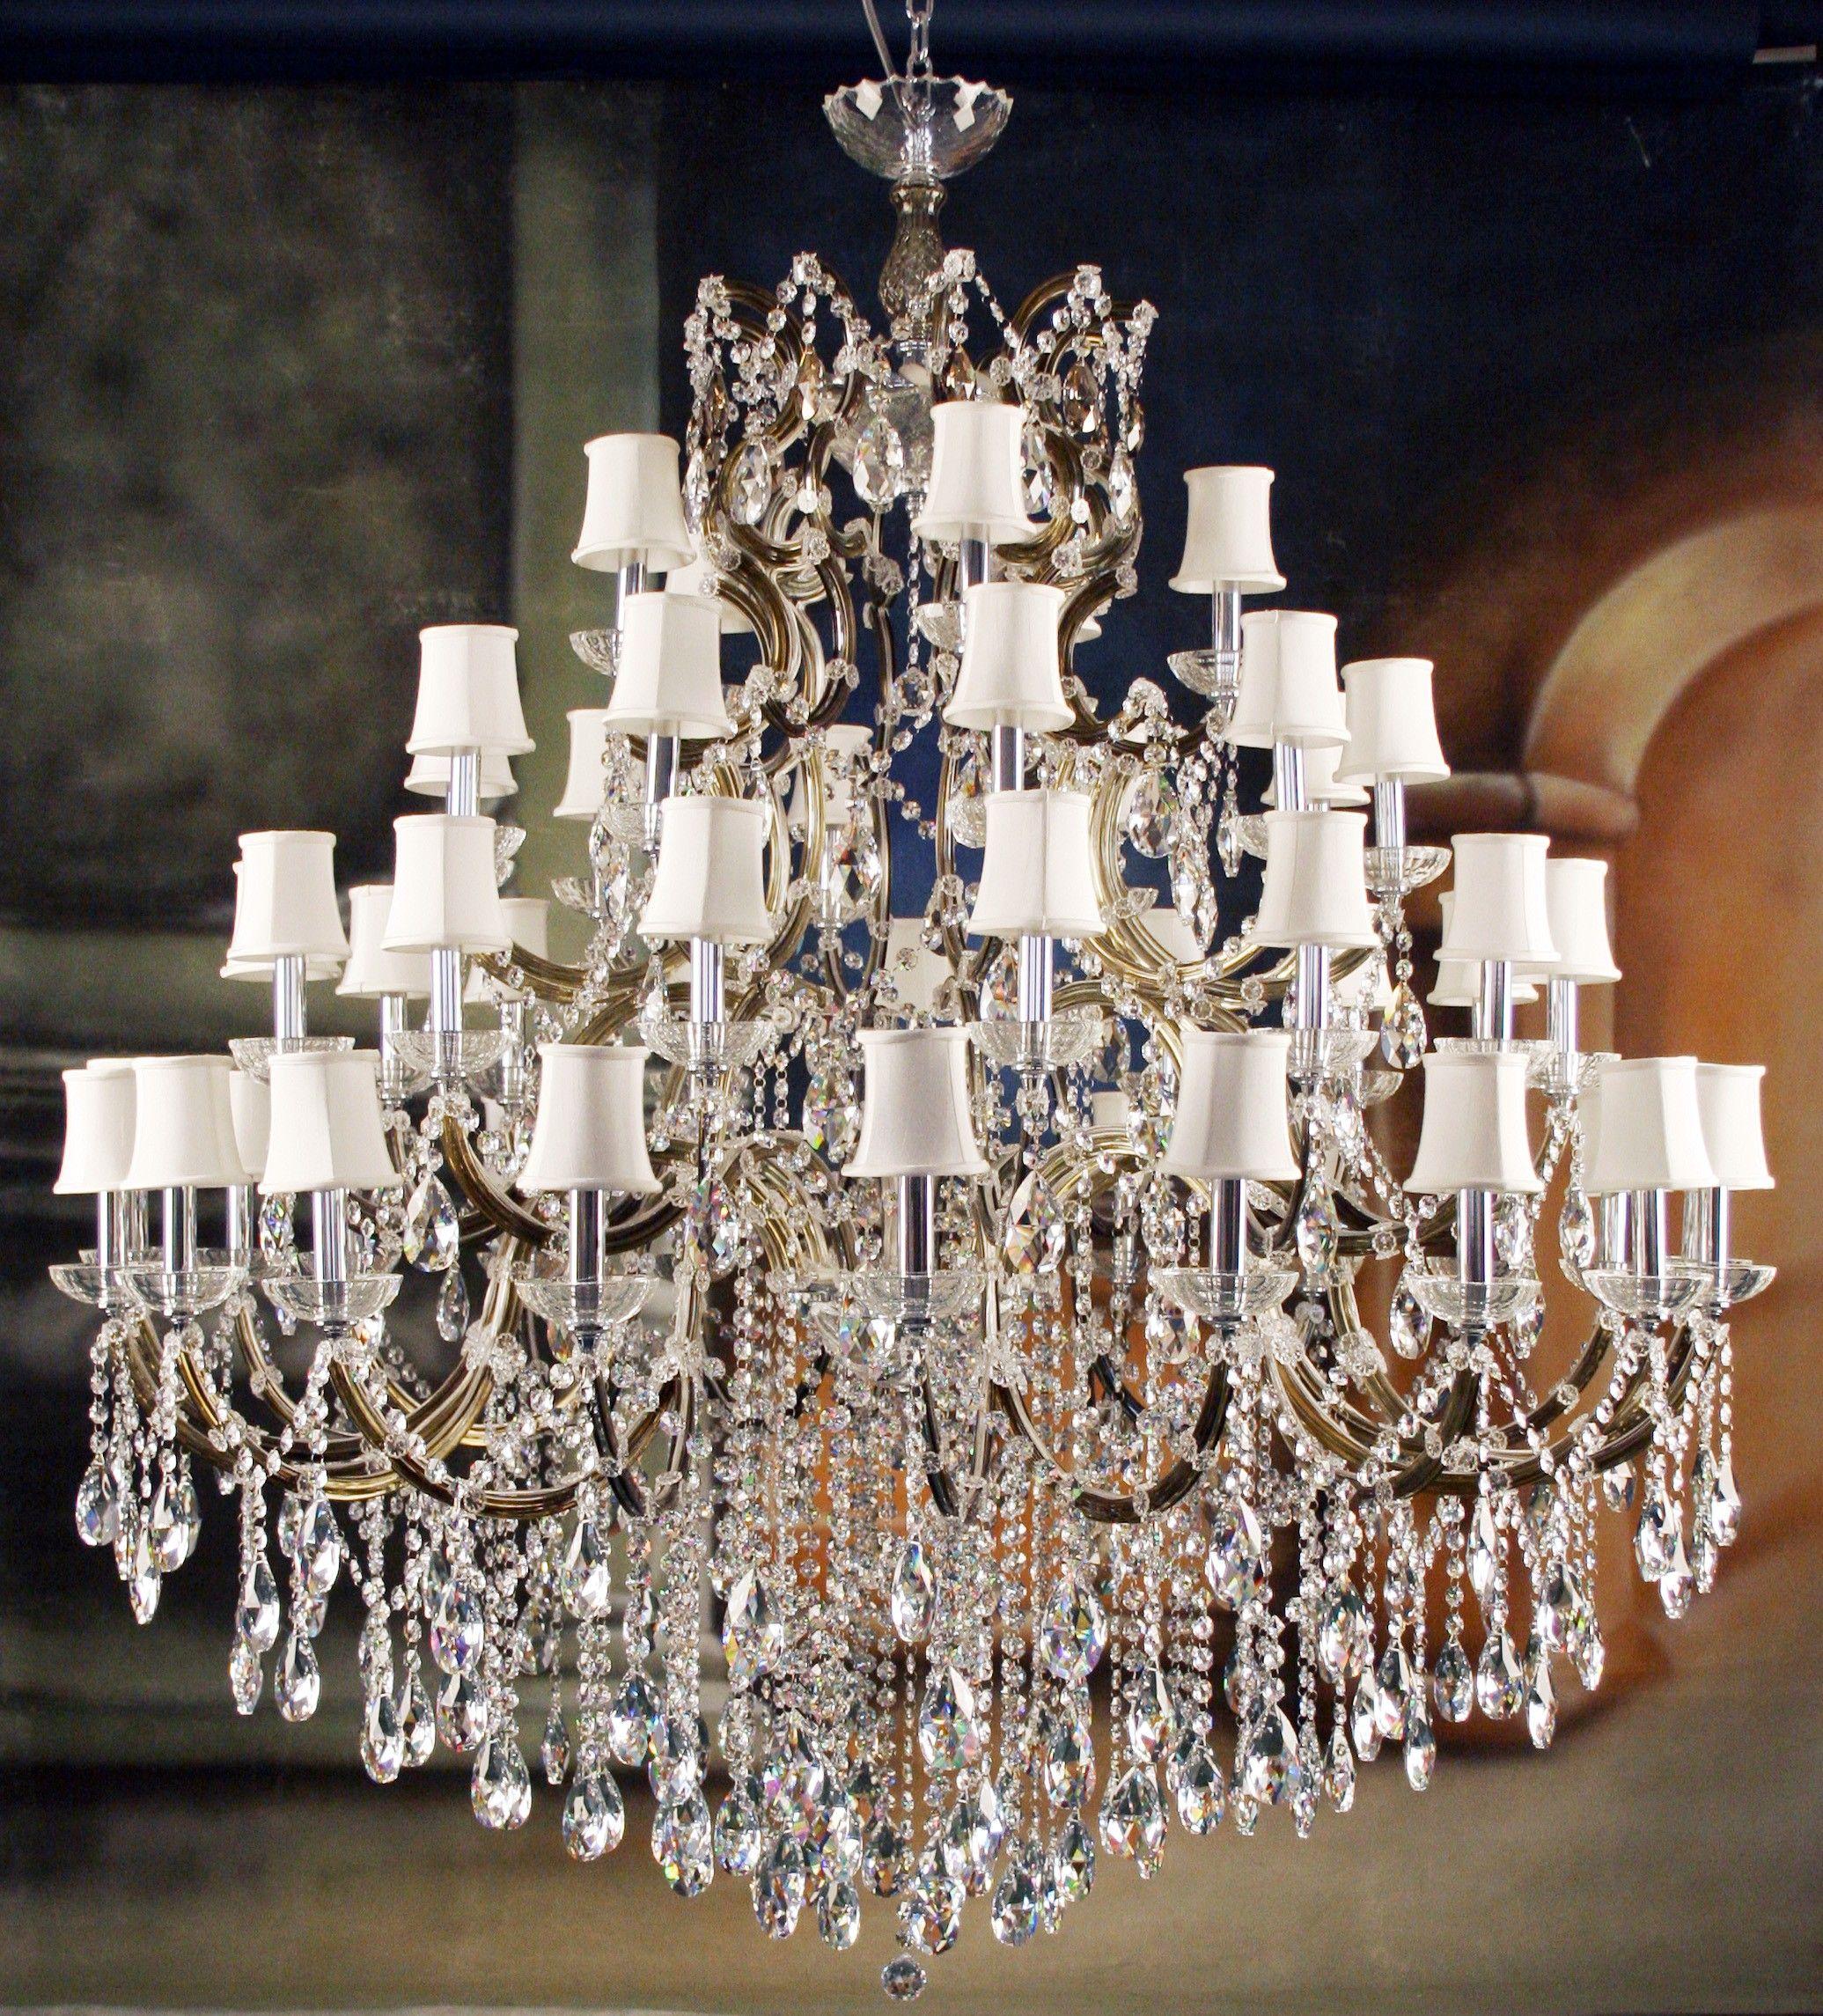 Impressive Unique Crystal Chandeliers Designer Lighting Glass Chandelier With